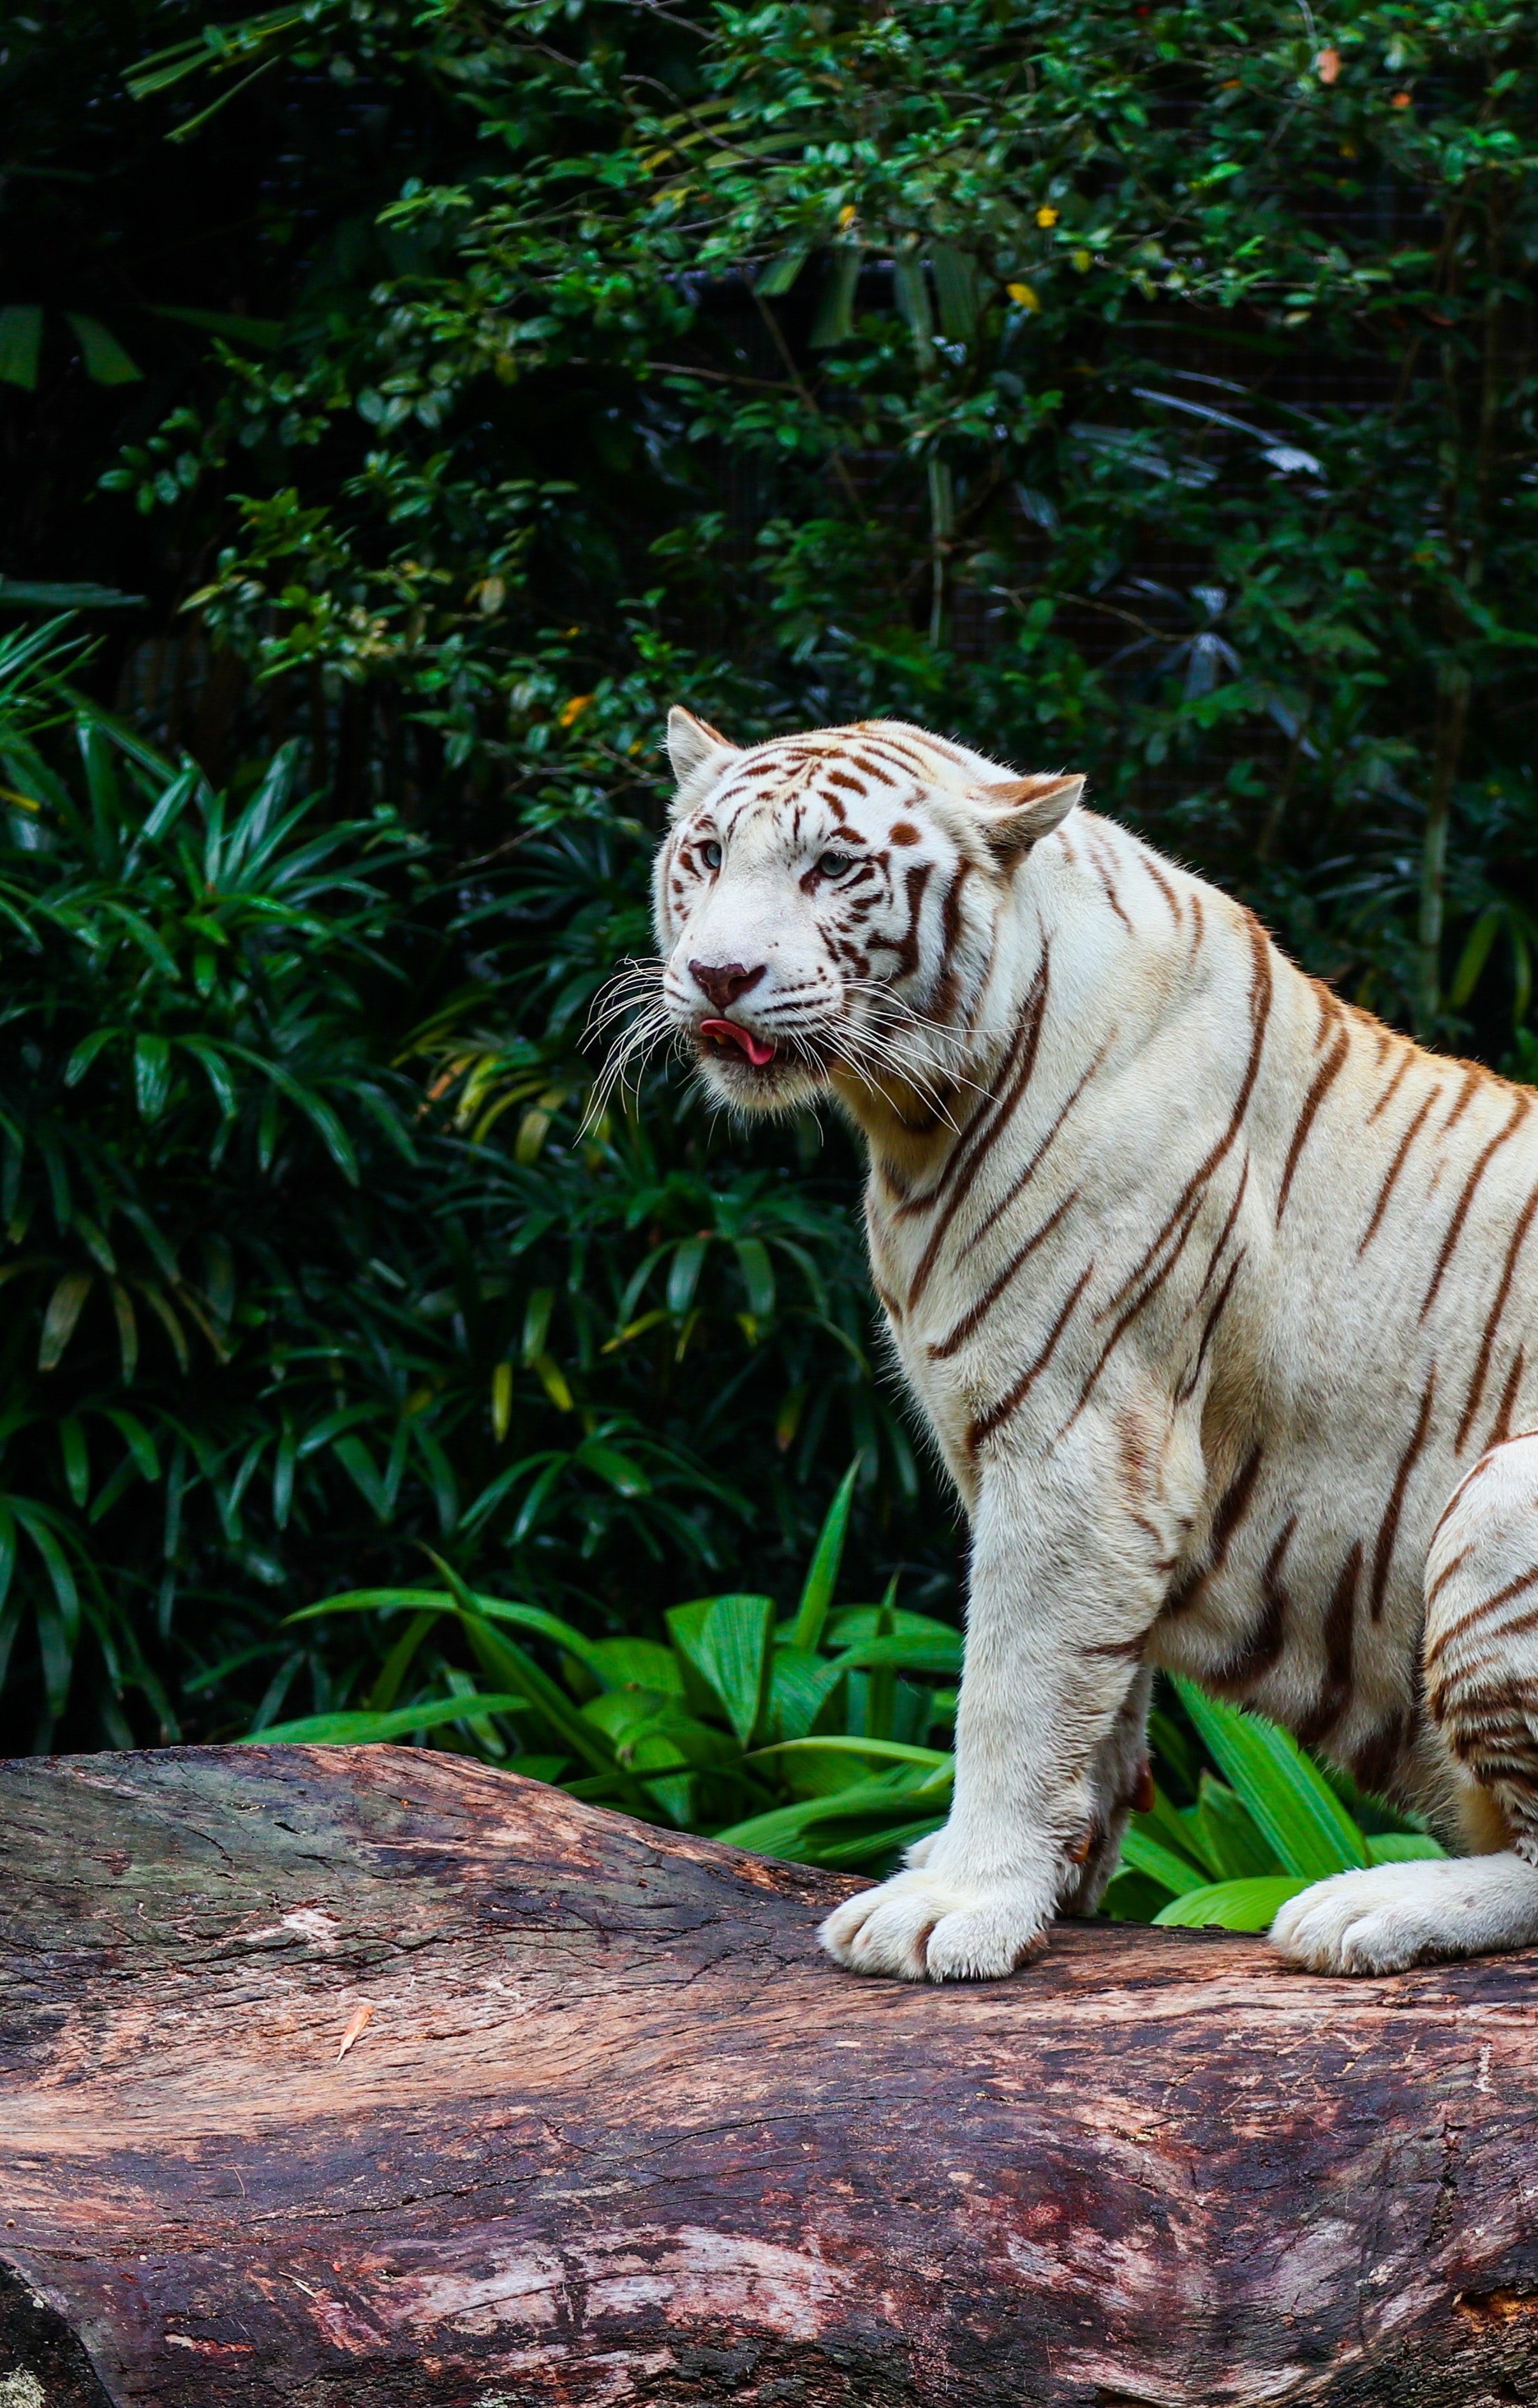 89594 download wallpaper Animals, Bengal Tiger, Tiger, Predator, Big Cat, Animal screensavers and pictures for free